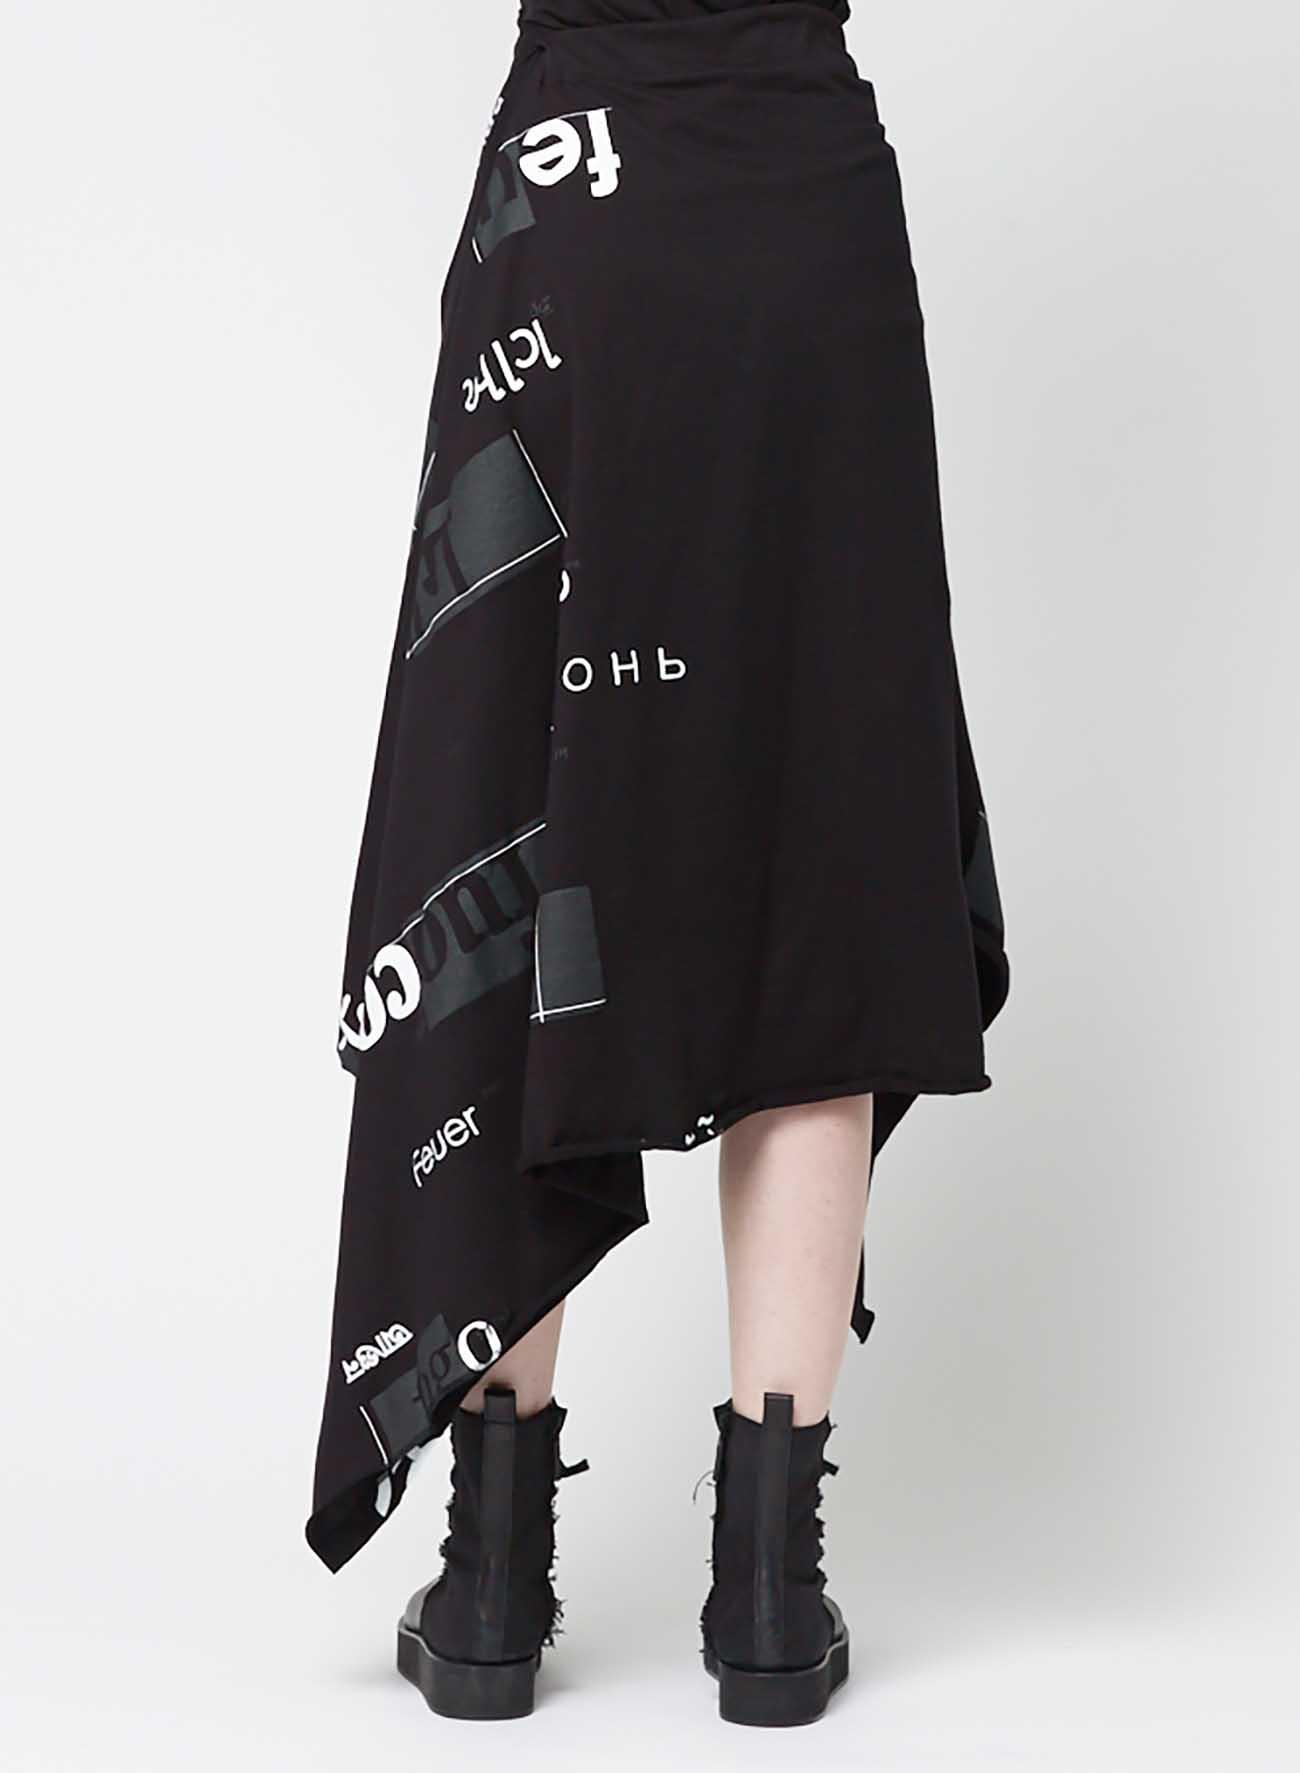 Words [Feu] Print 2 Drape Cut and sew Skirt